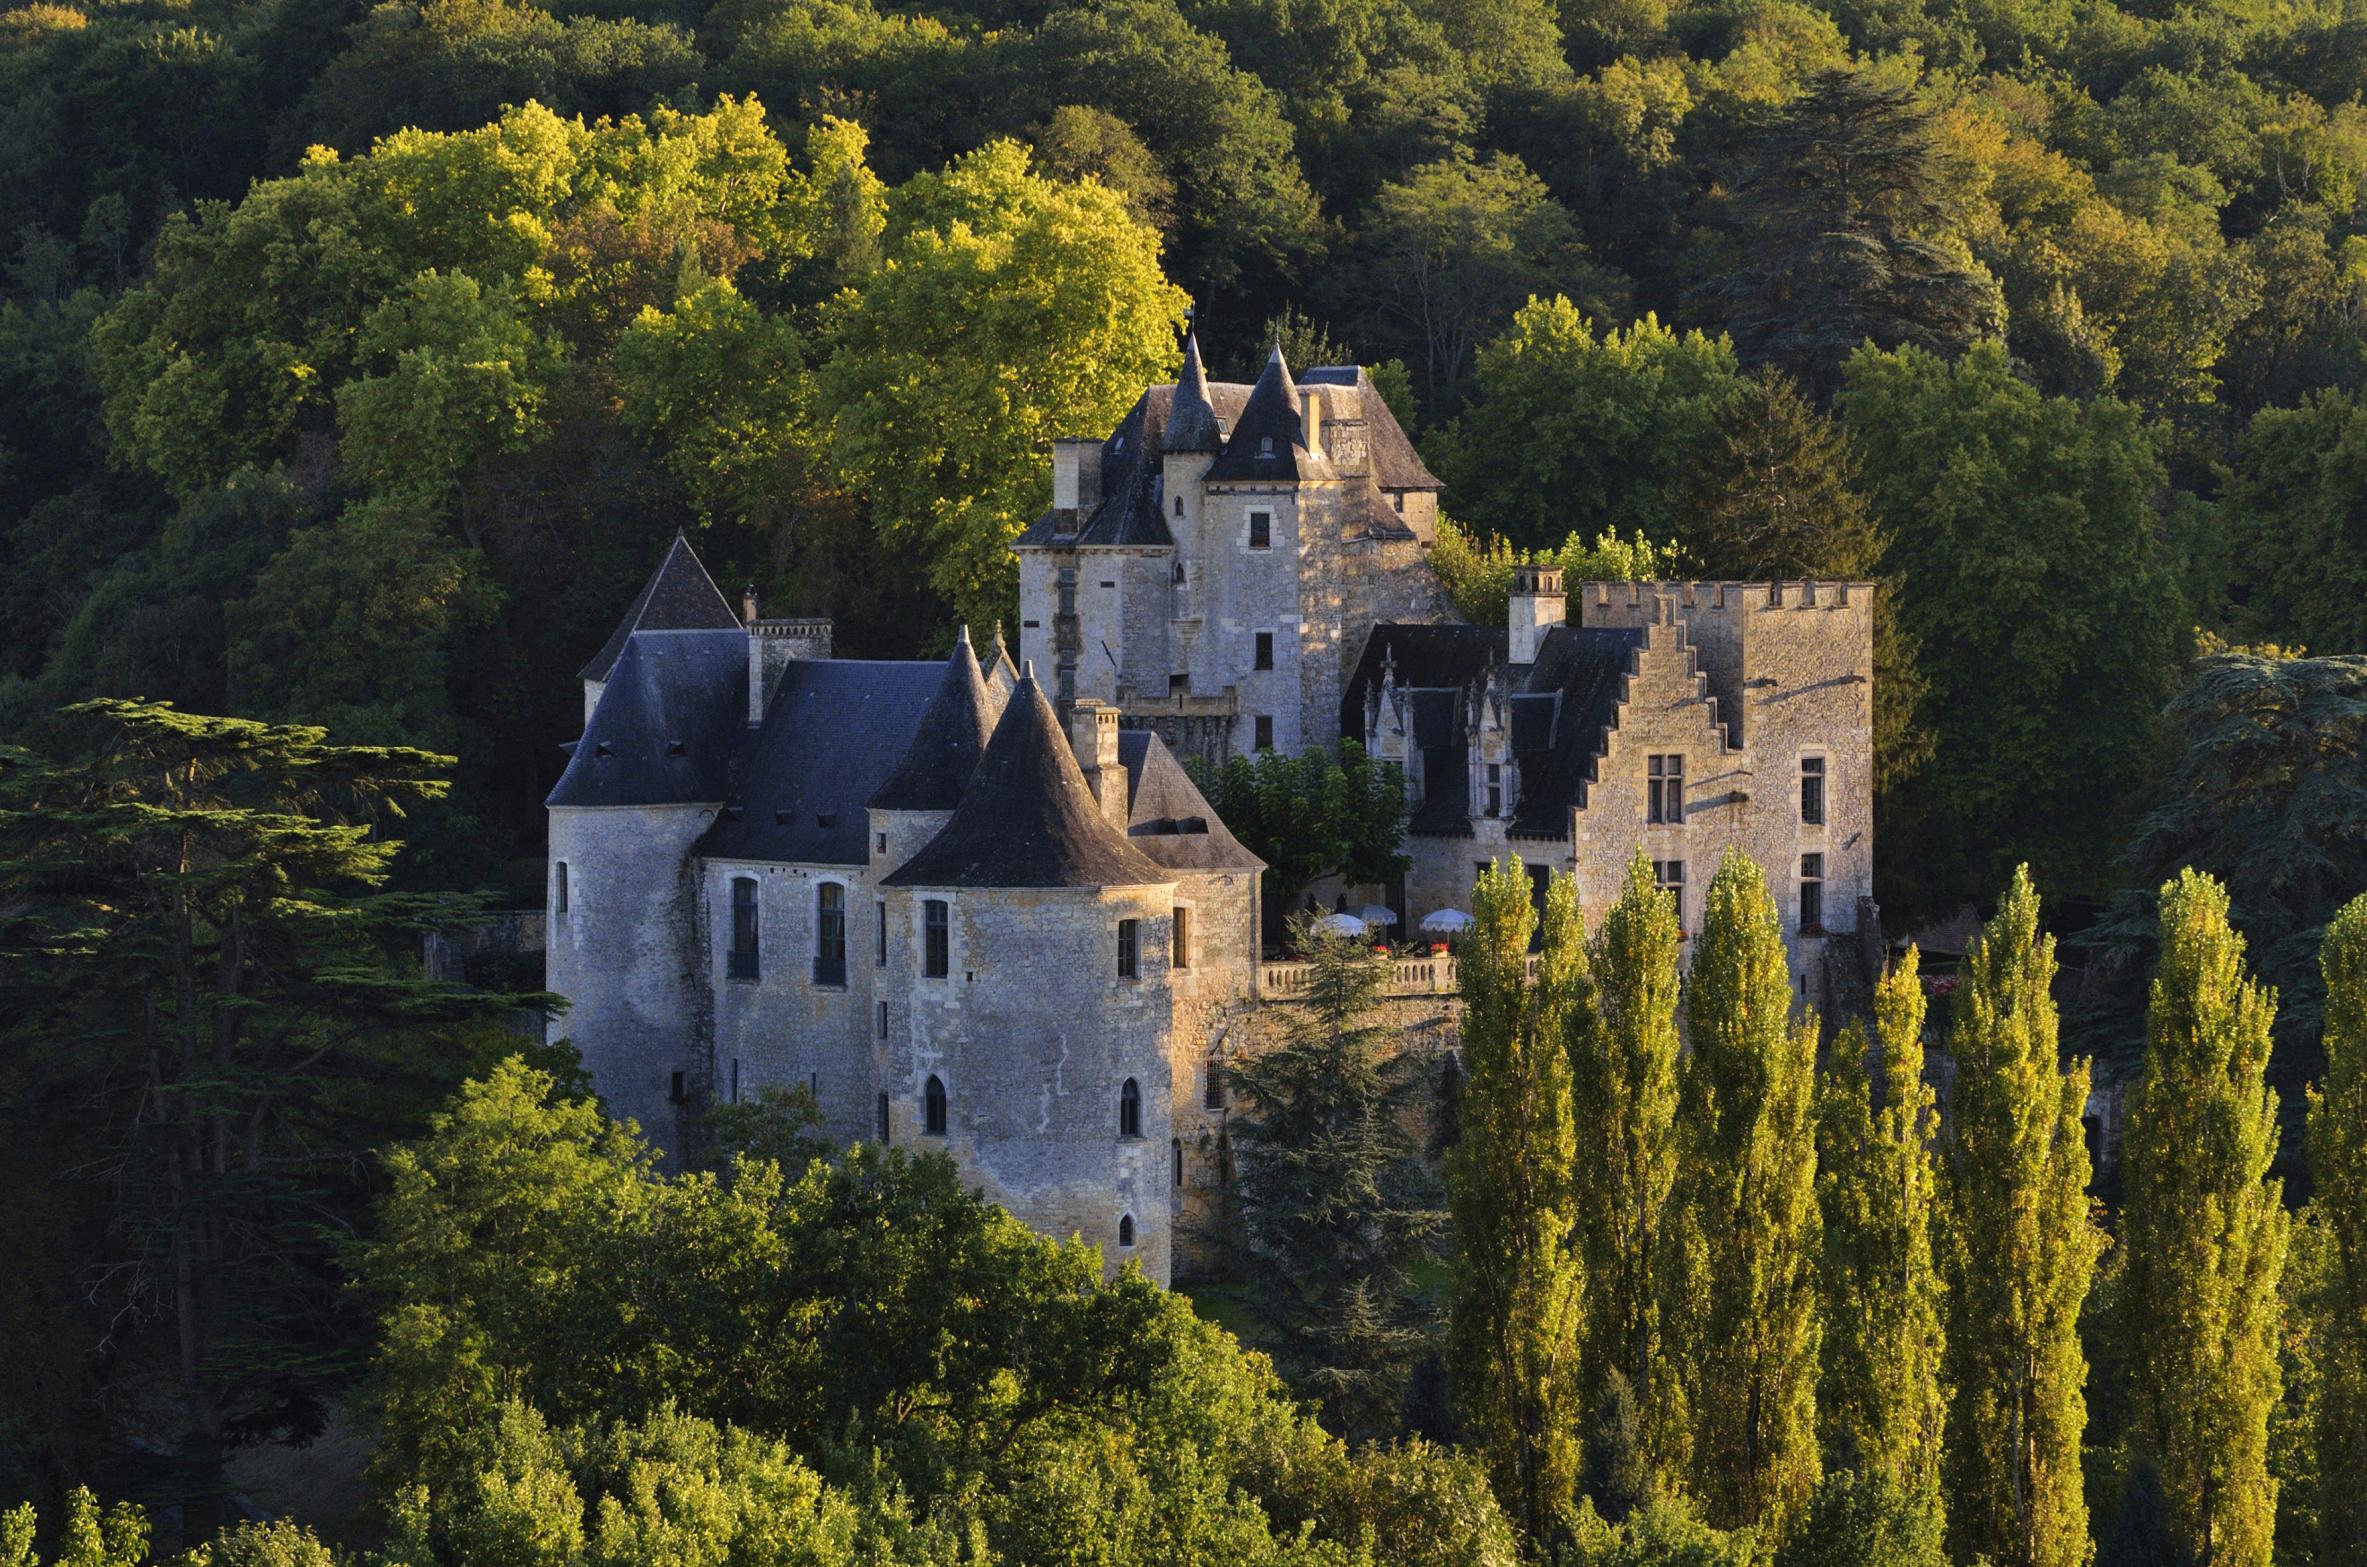 d47f4aadded04d76dbe a4f0d384 chateau de beynac